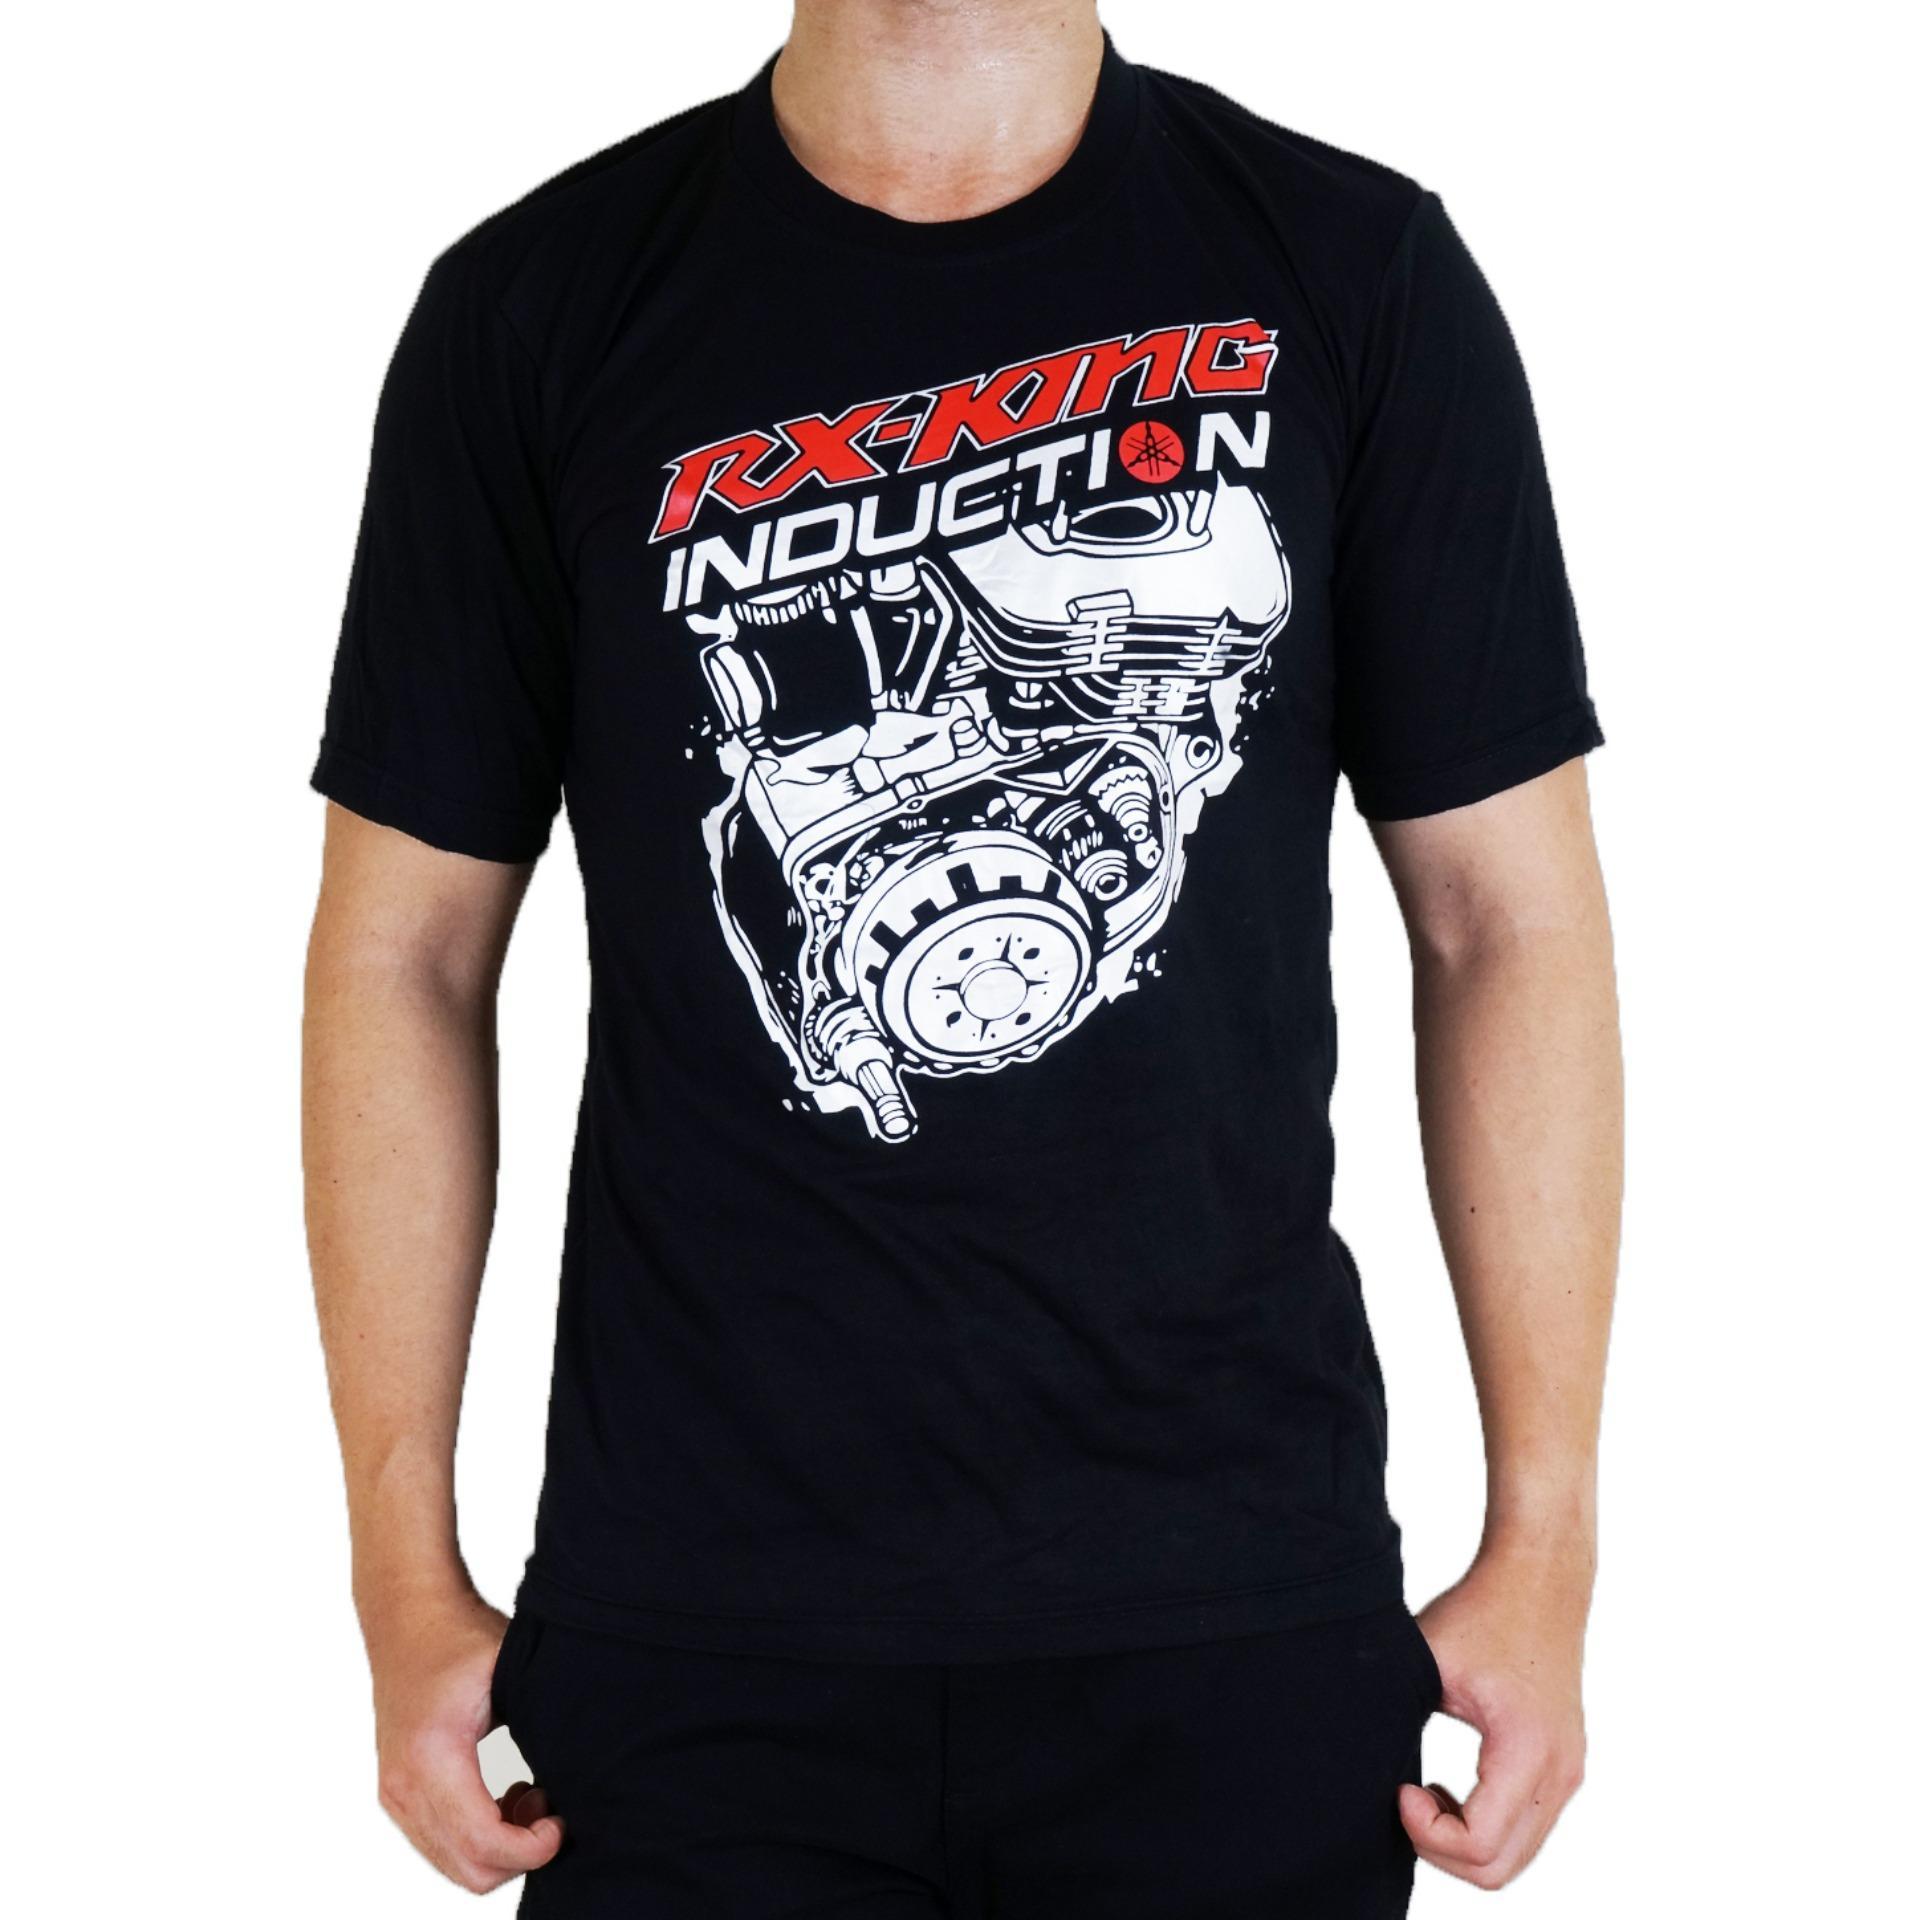 Vanwin - Kaos Distro Premium Pria Racing RX King Induction - Hitam